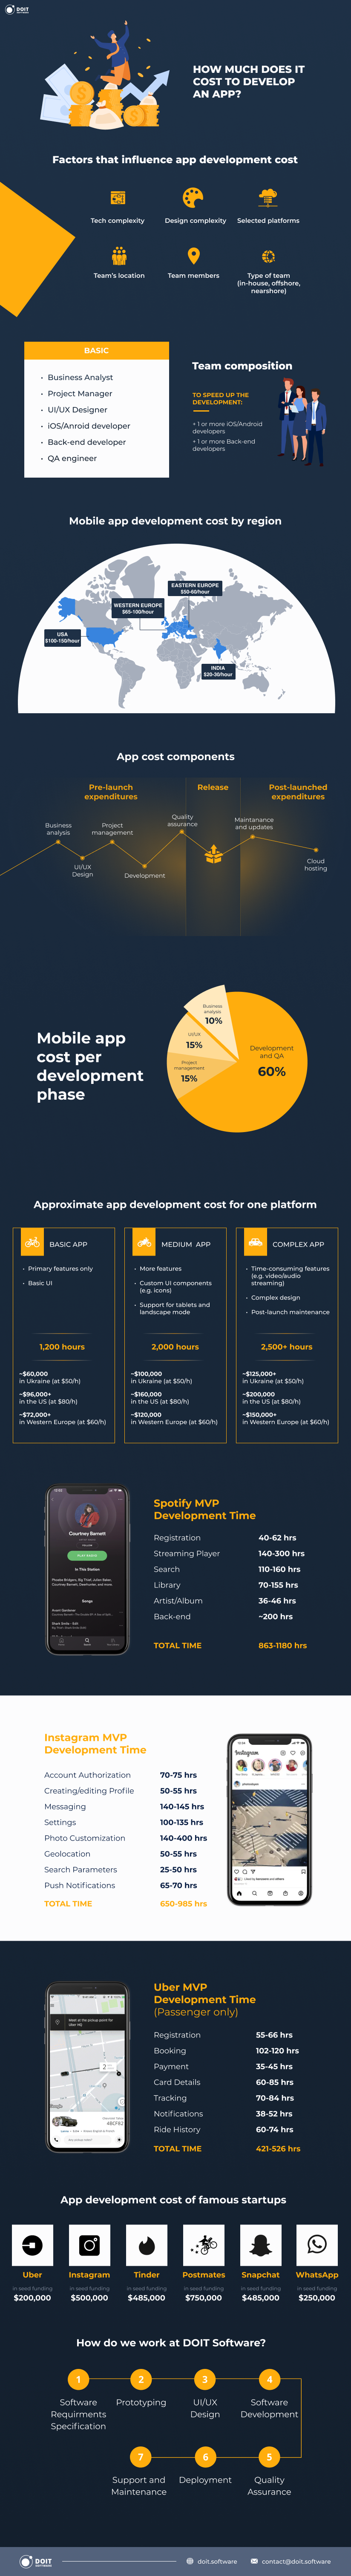 app development cost guide